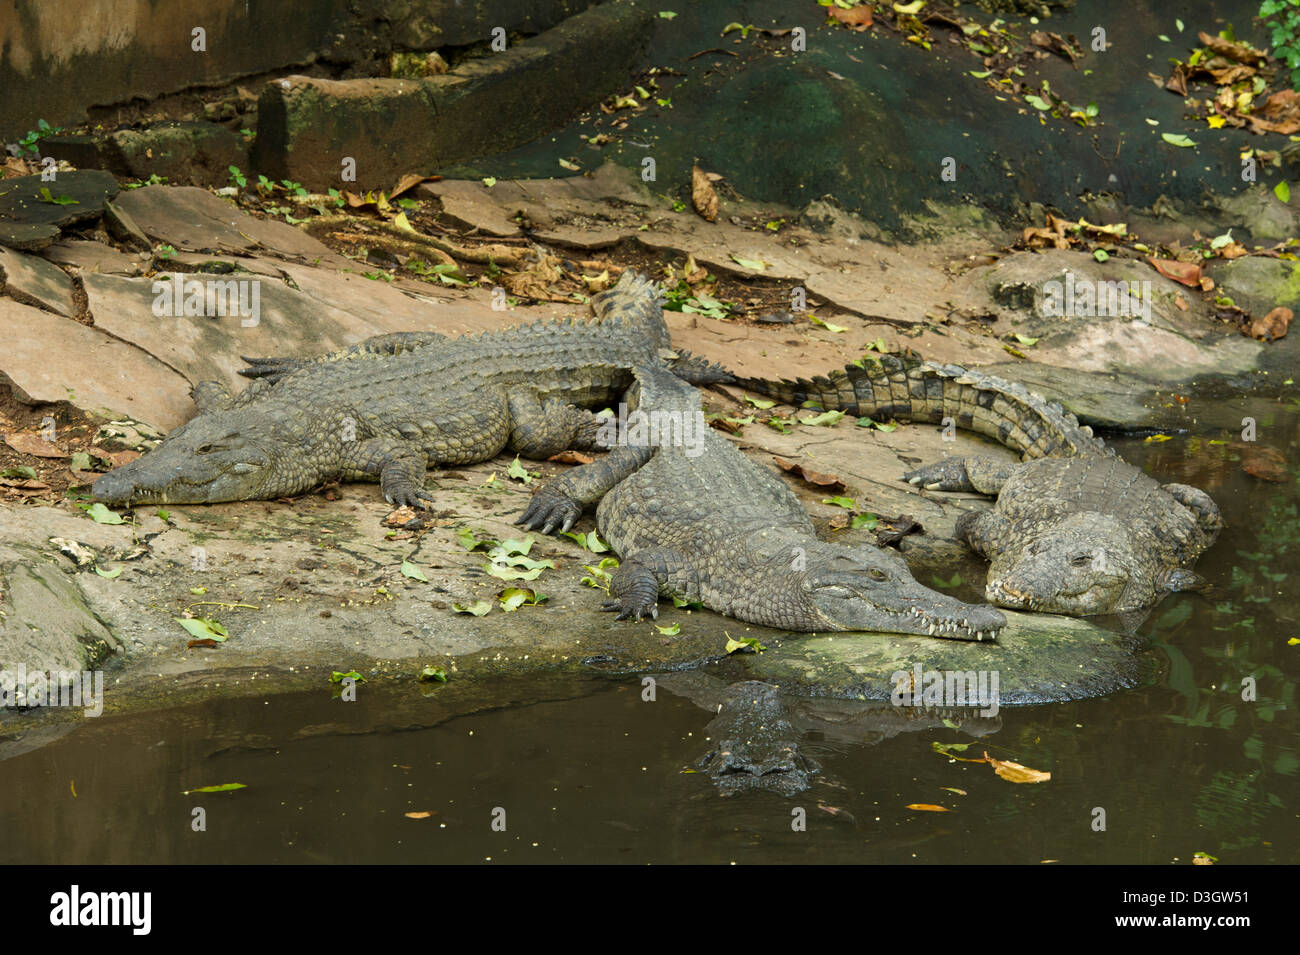 Nile crocodiles, Mamba Village crocodile farm, Mombasa, Kenya - Stock Image